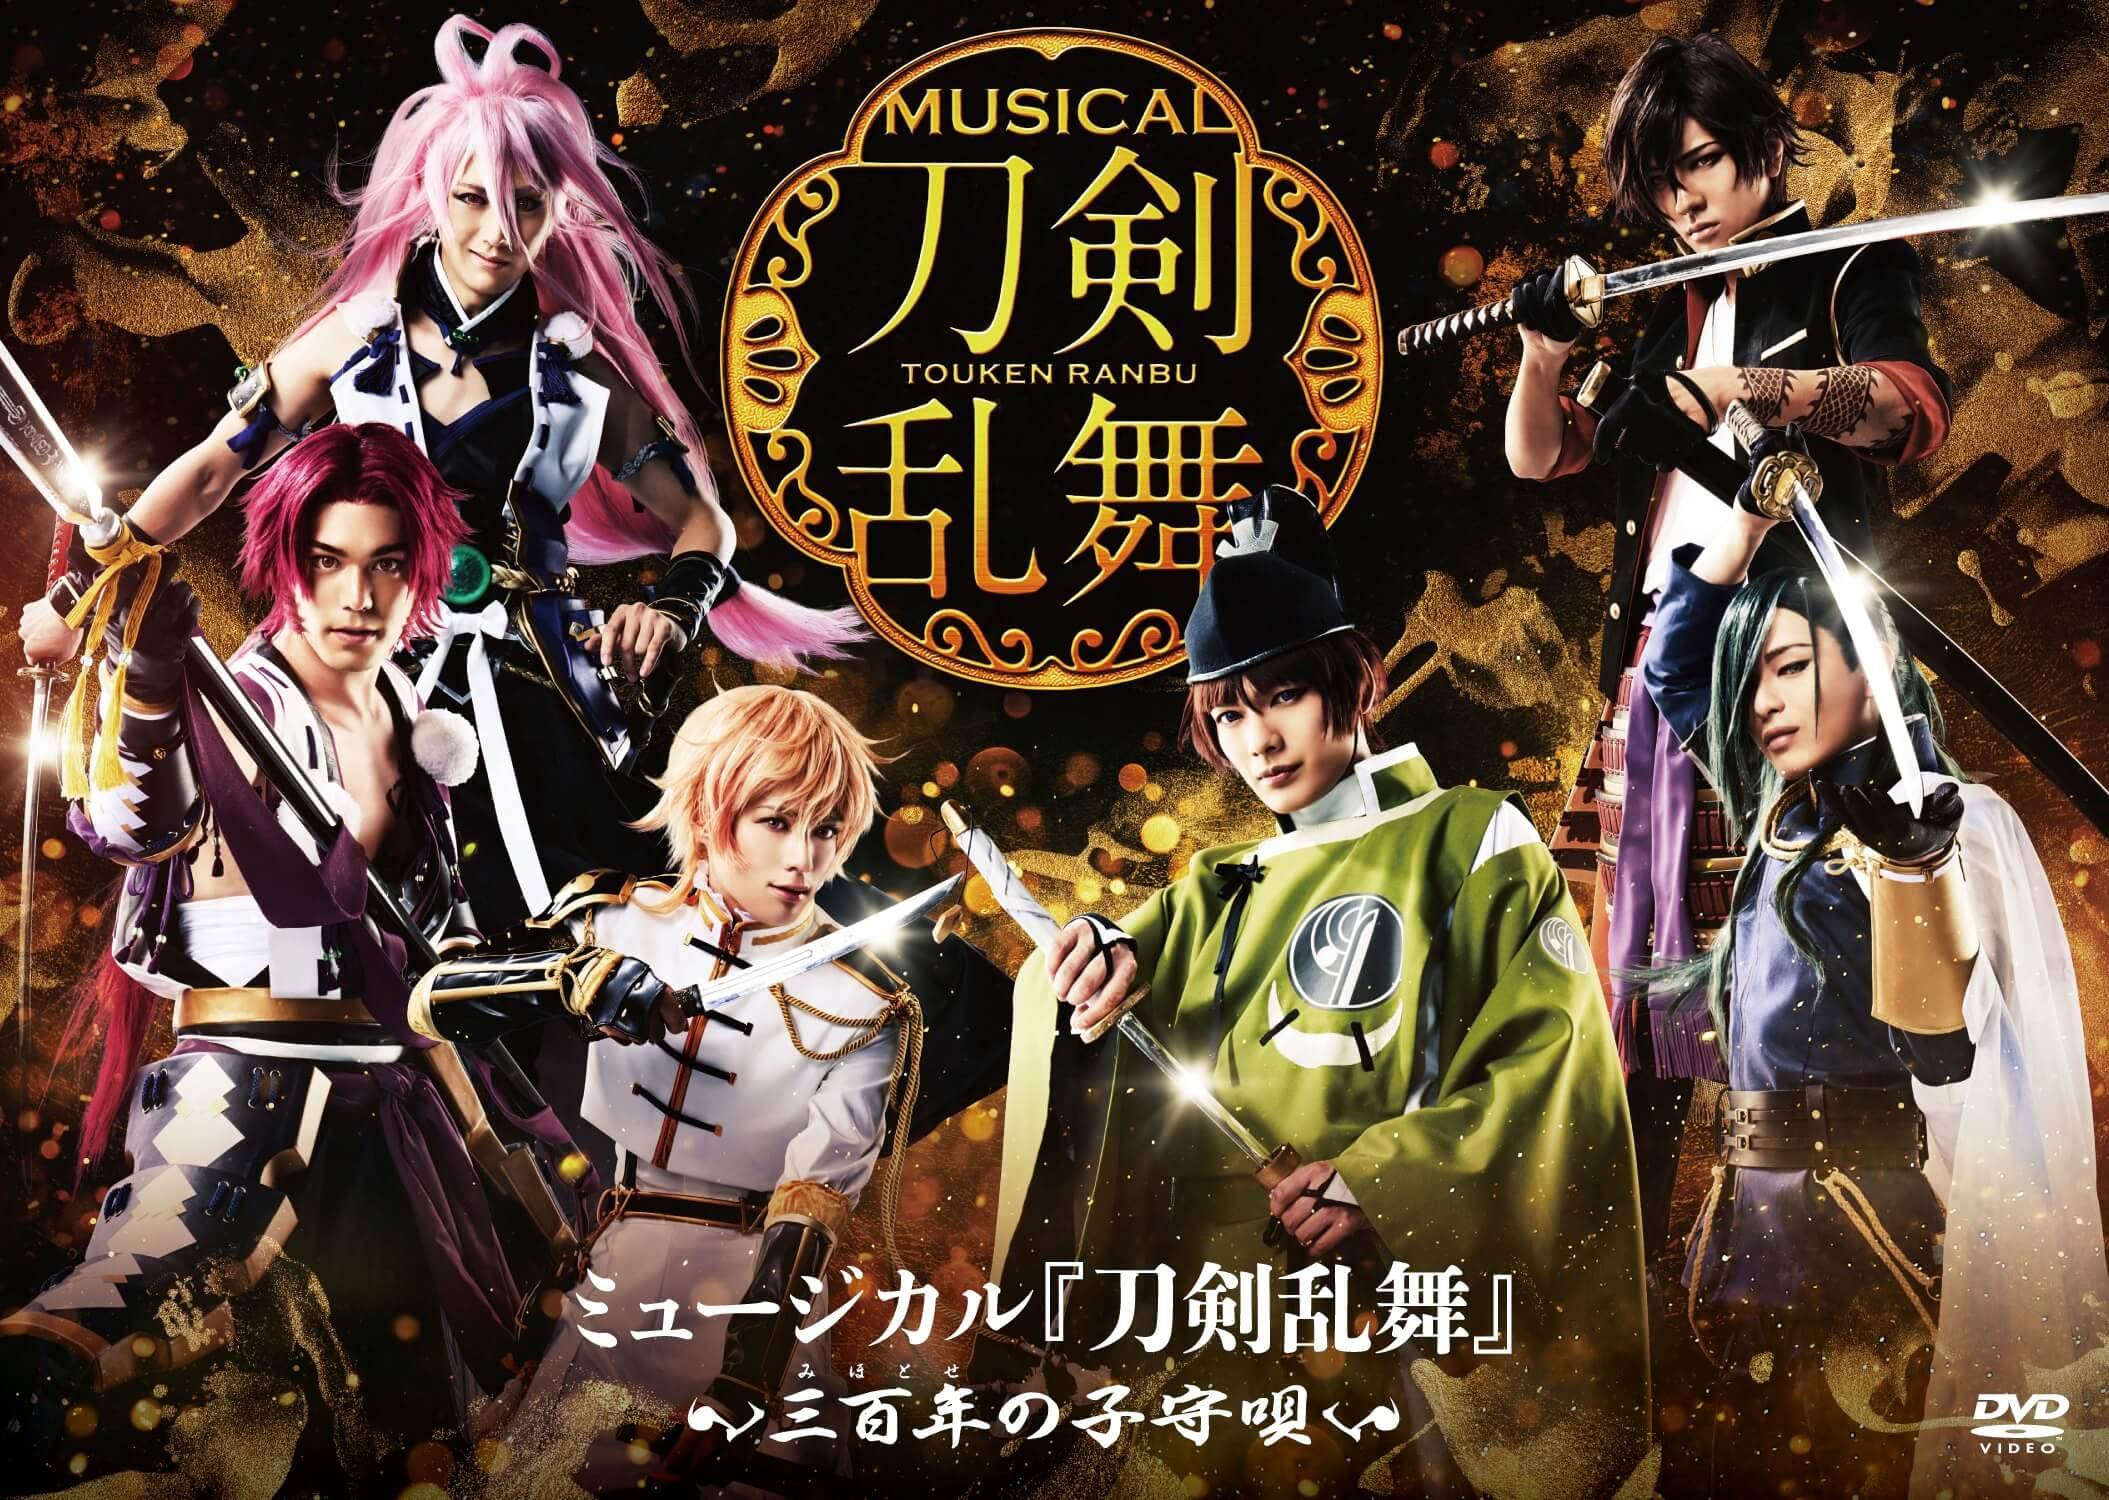 EMPV-7 / ミュージカル『刀剣乱舞』〜三百年の子守唄〜 / ミュージカル『刀剣乱舞』 / DVD